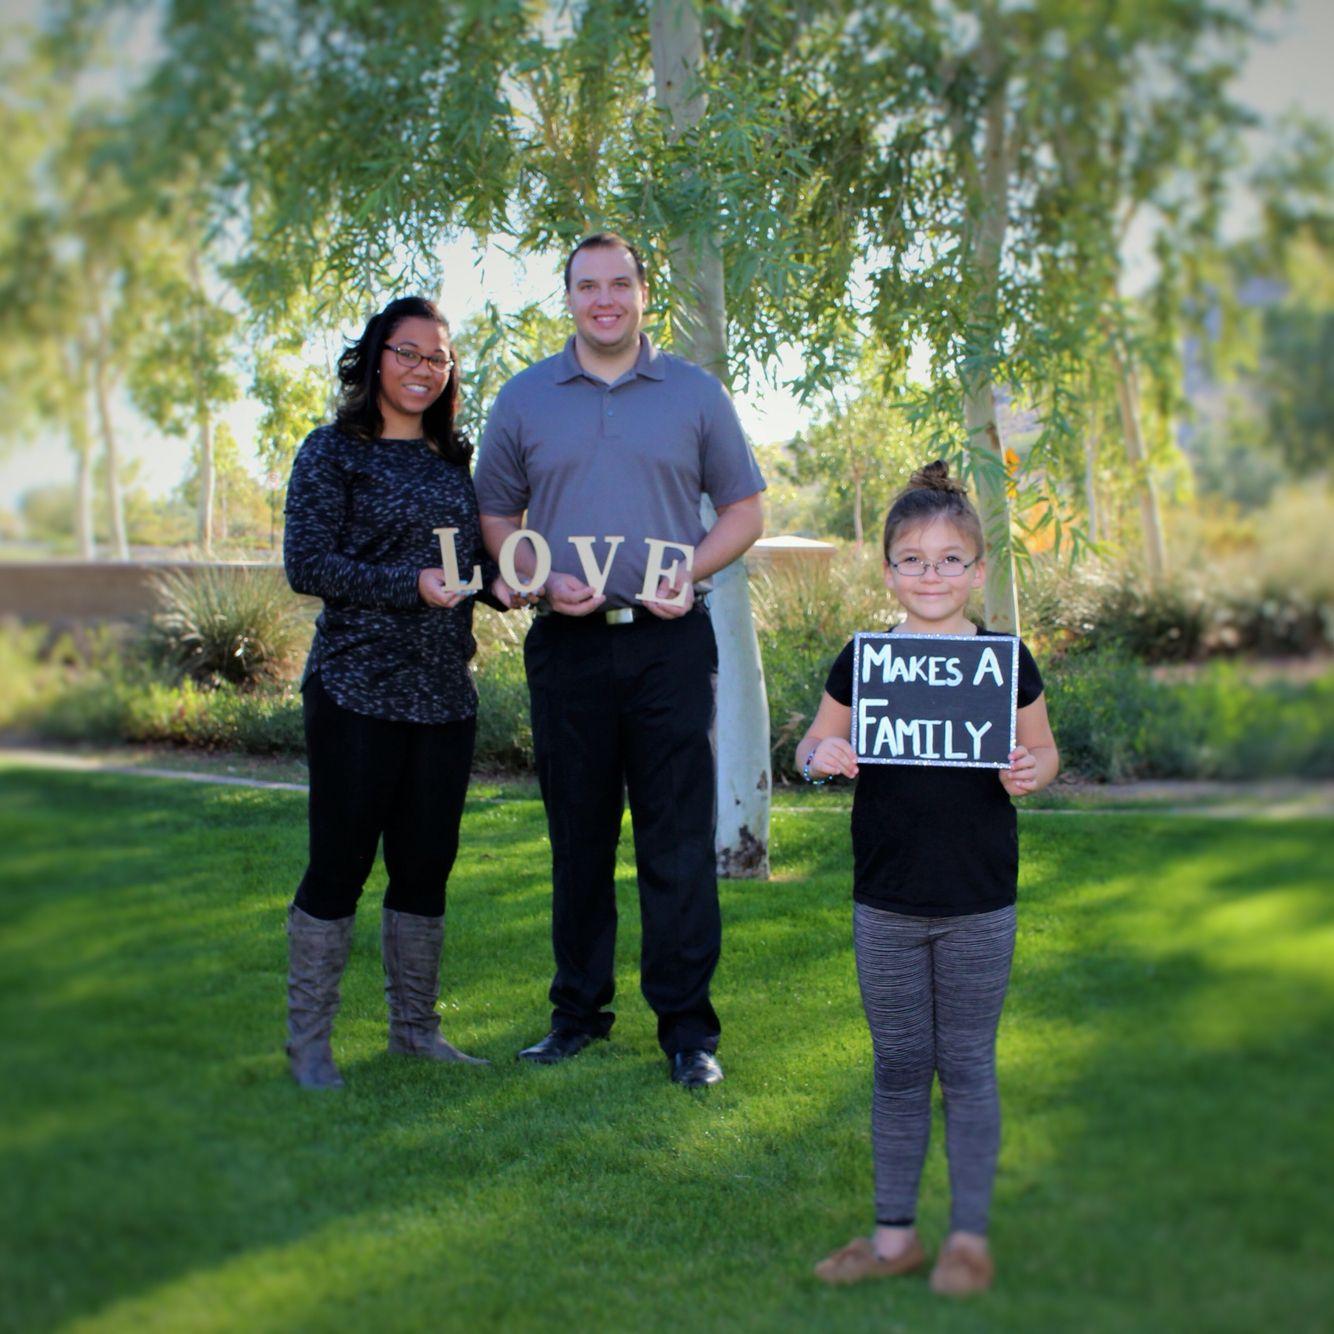 Blended family photos